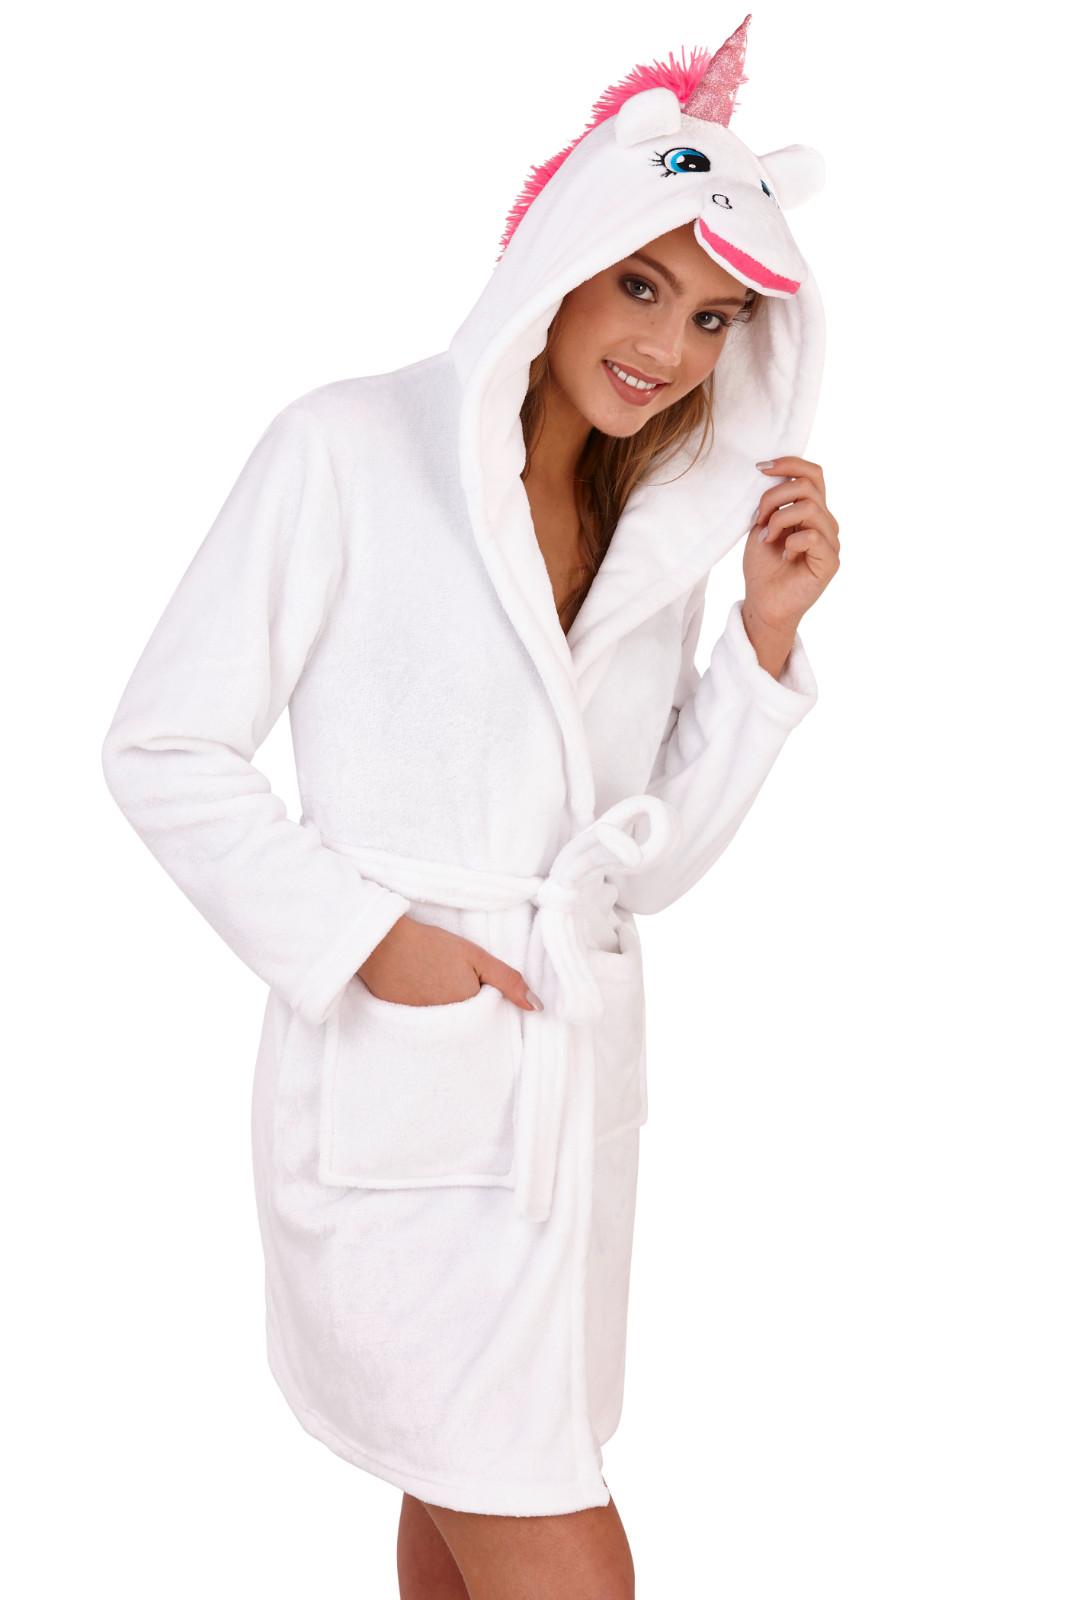 Womens Unicorn Dressing Gown 3D Character Hooded Soft Fleece Housecoat Bath Robe